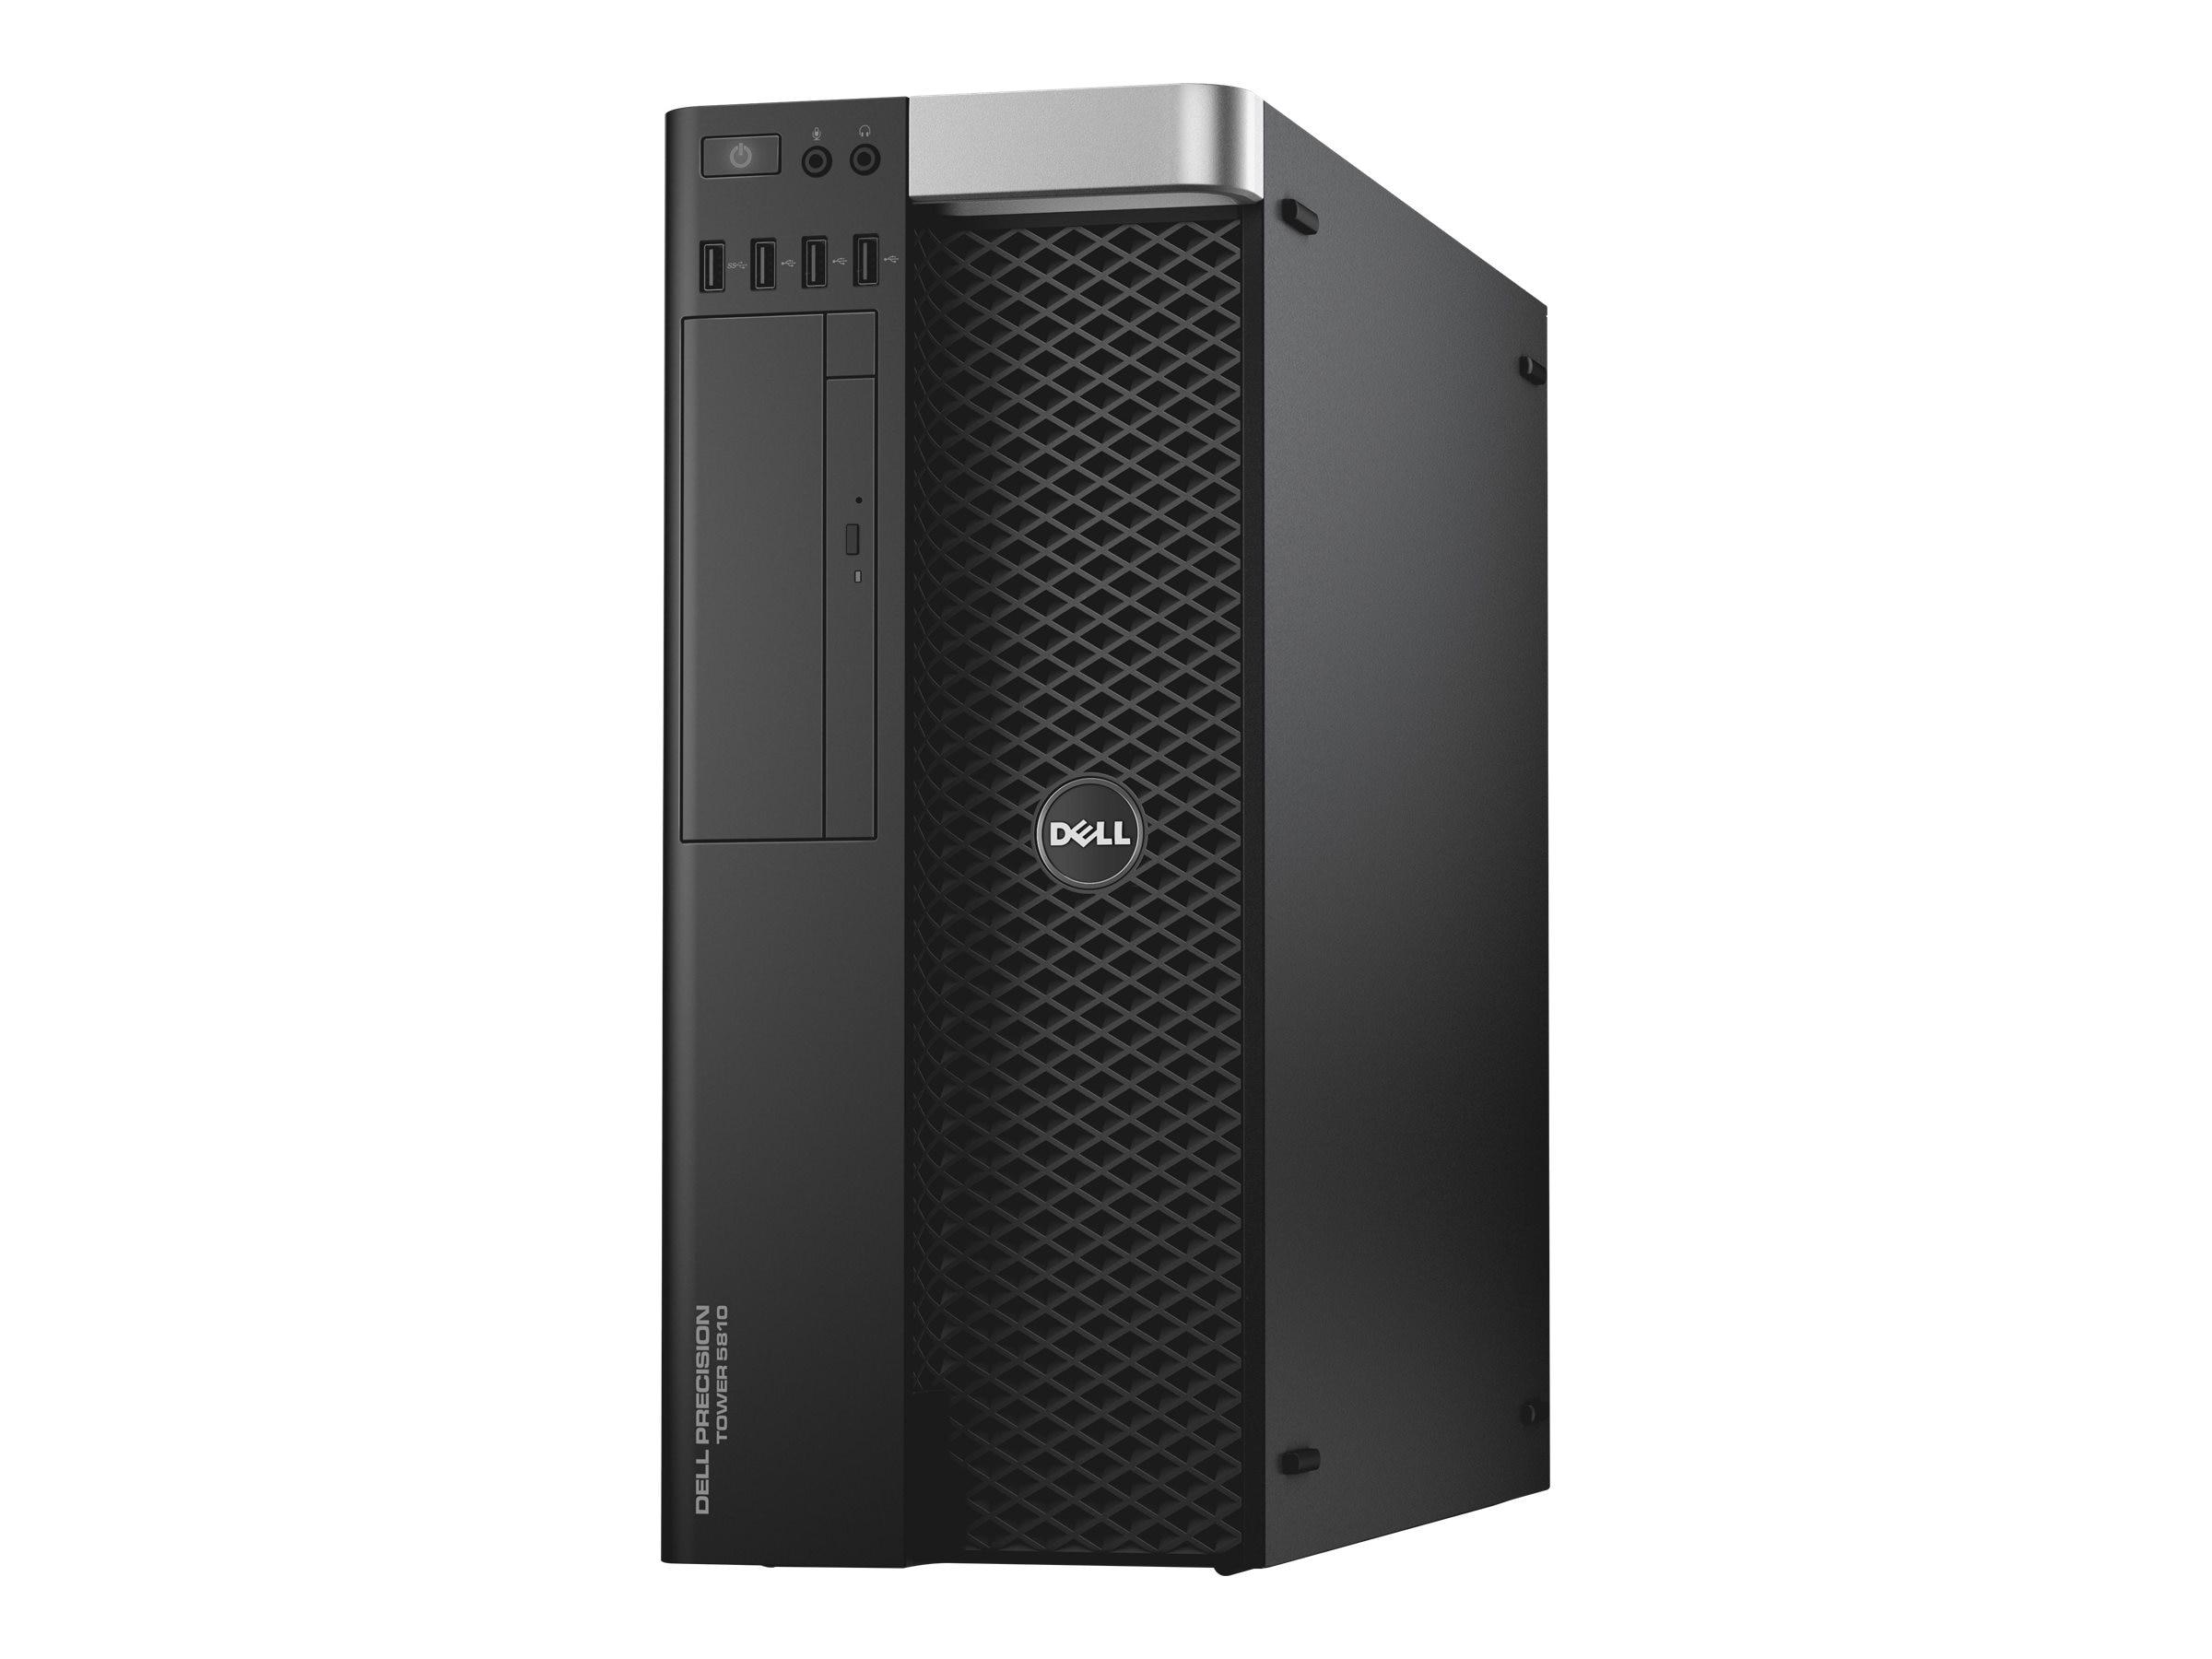 Dell 5DCR2 Image 1